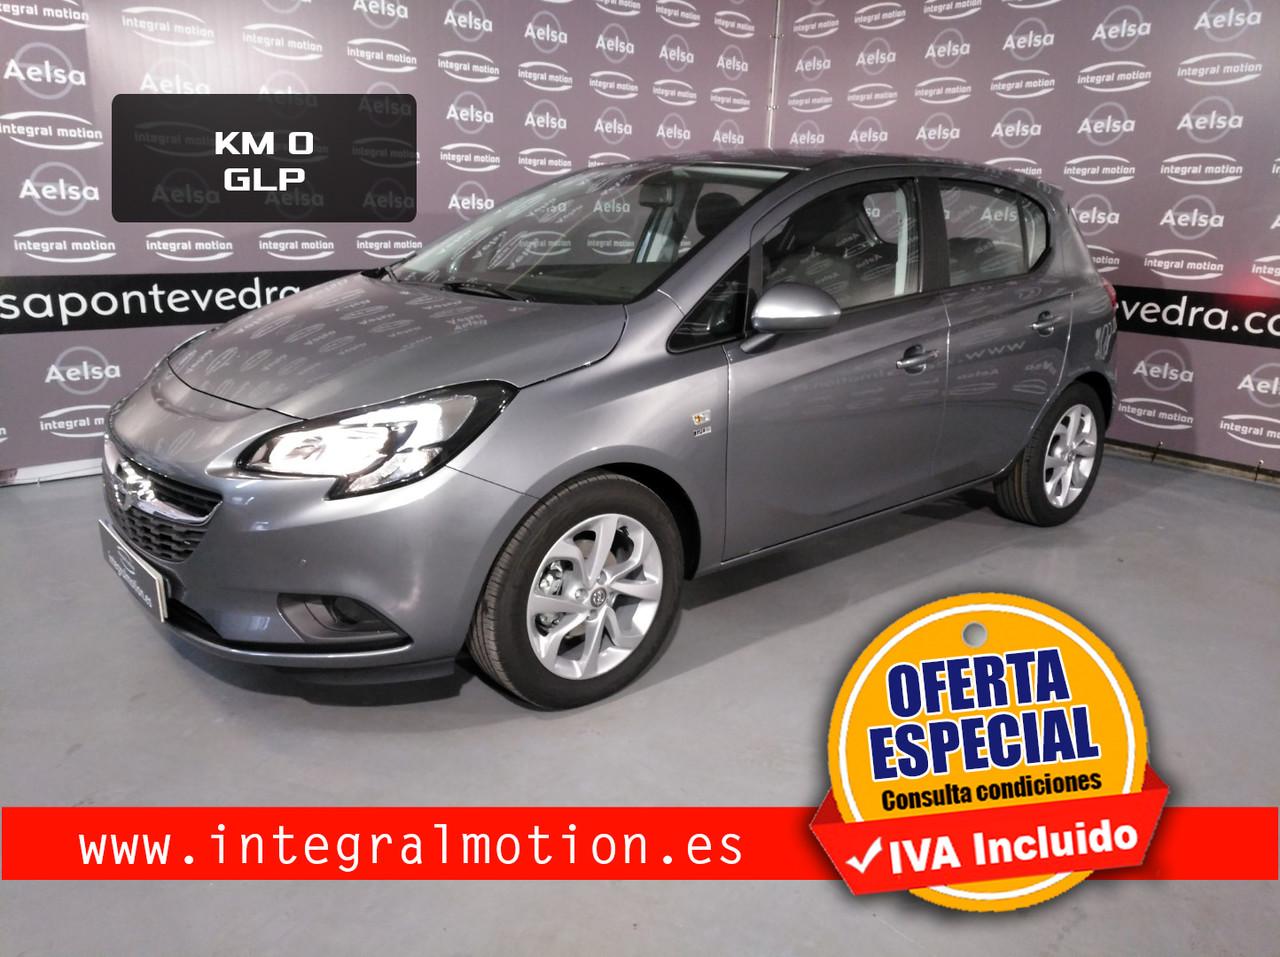 Opel Corsa 1.4 66kW (90CV) 120 Aniversario GLP  - Foto 1